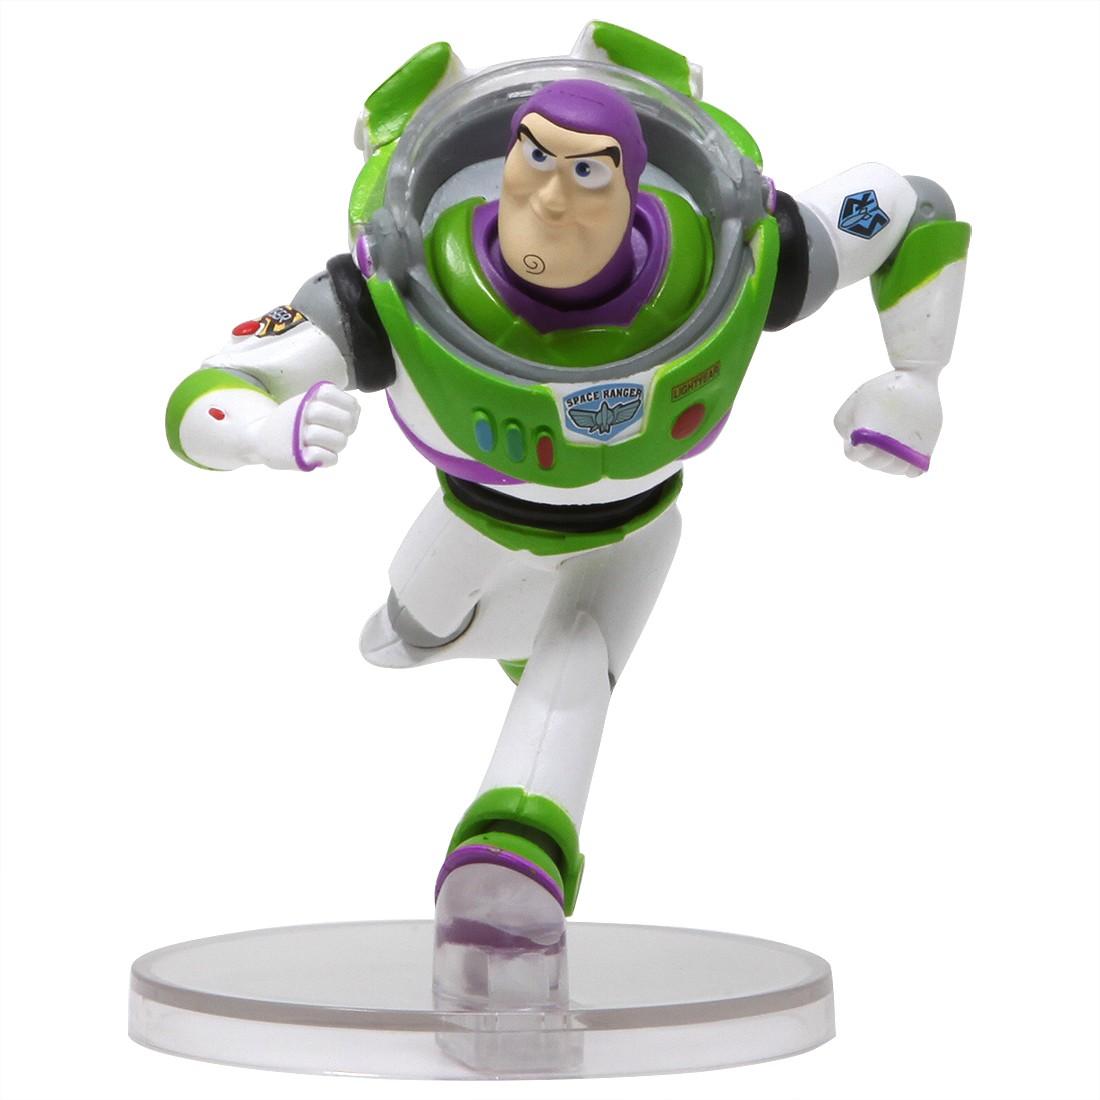 Medicom UDF Toy Story 4 Buzz Lightyear Ultra Detail Figure (white)